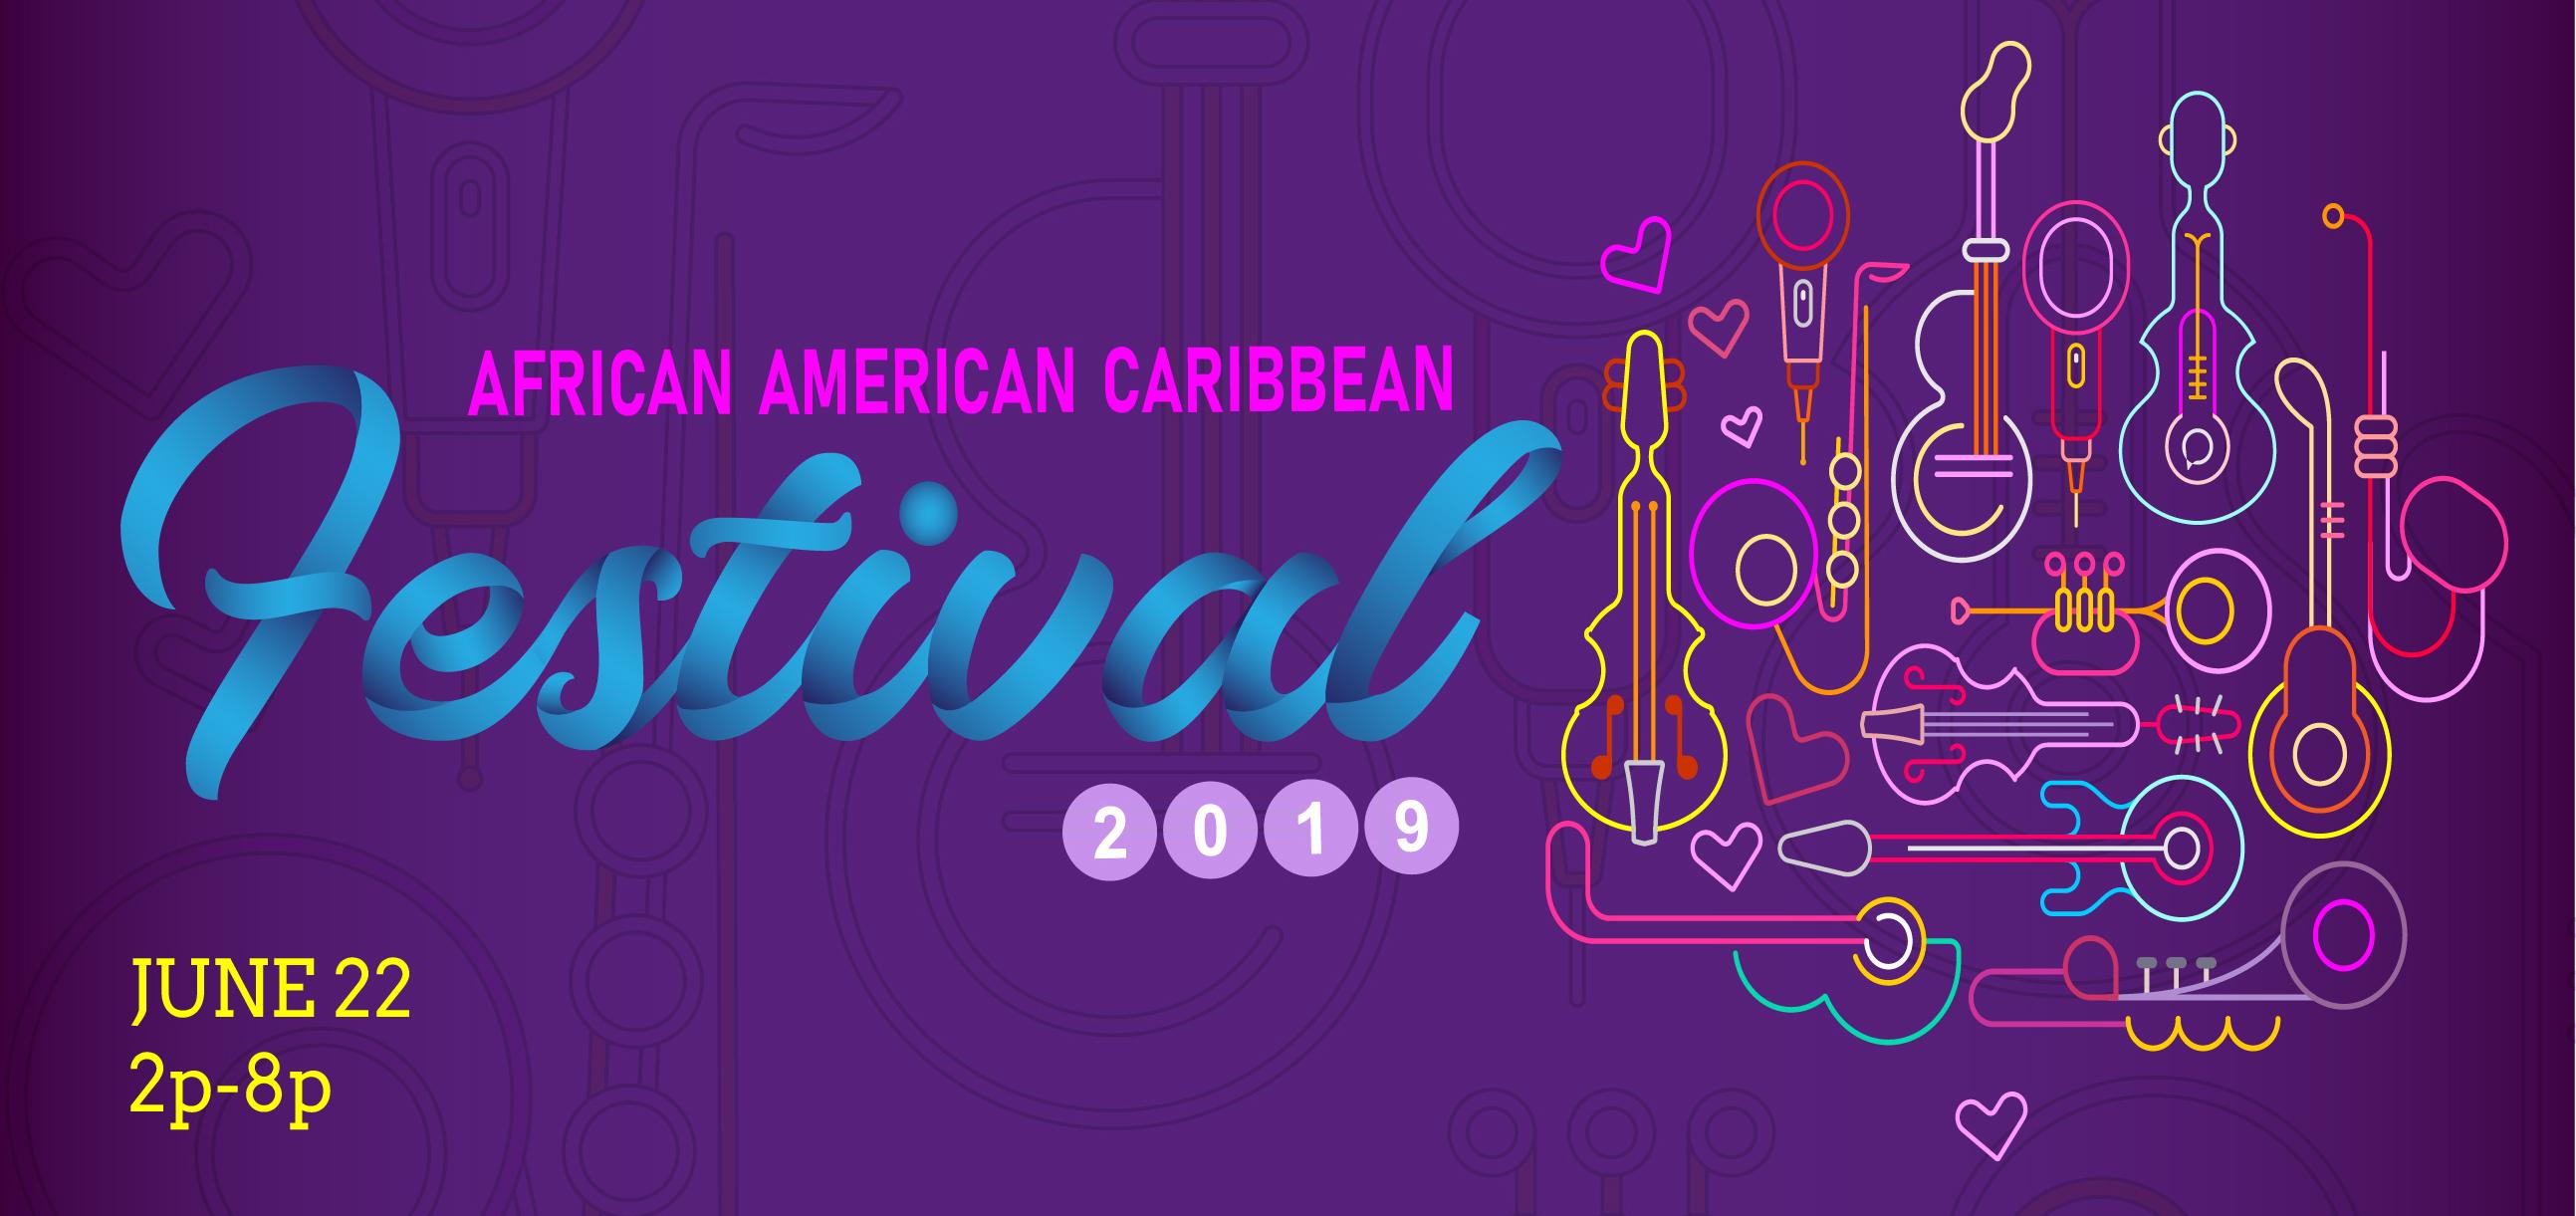 African American Caribbean Festival 2019: Make Noise!